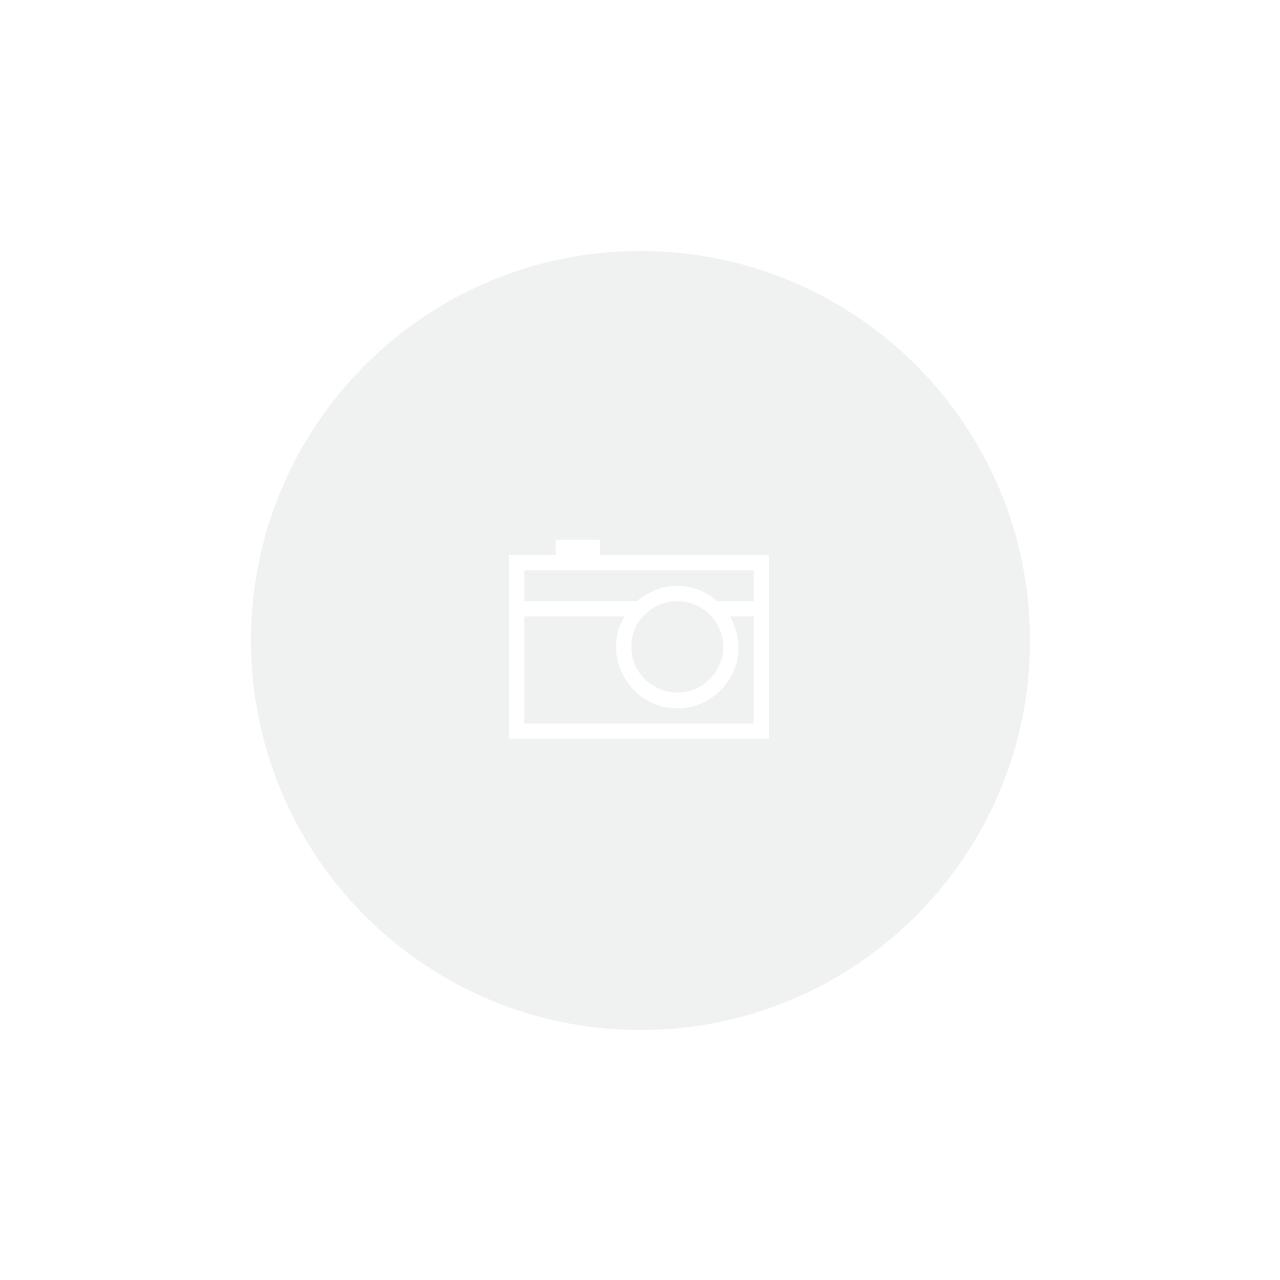 Lâmina Oster Máquina Artisan, Baby ou Minimax - Estreita